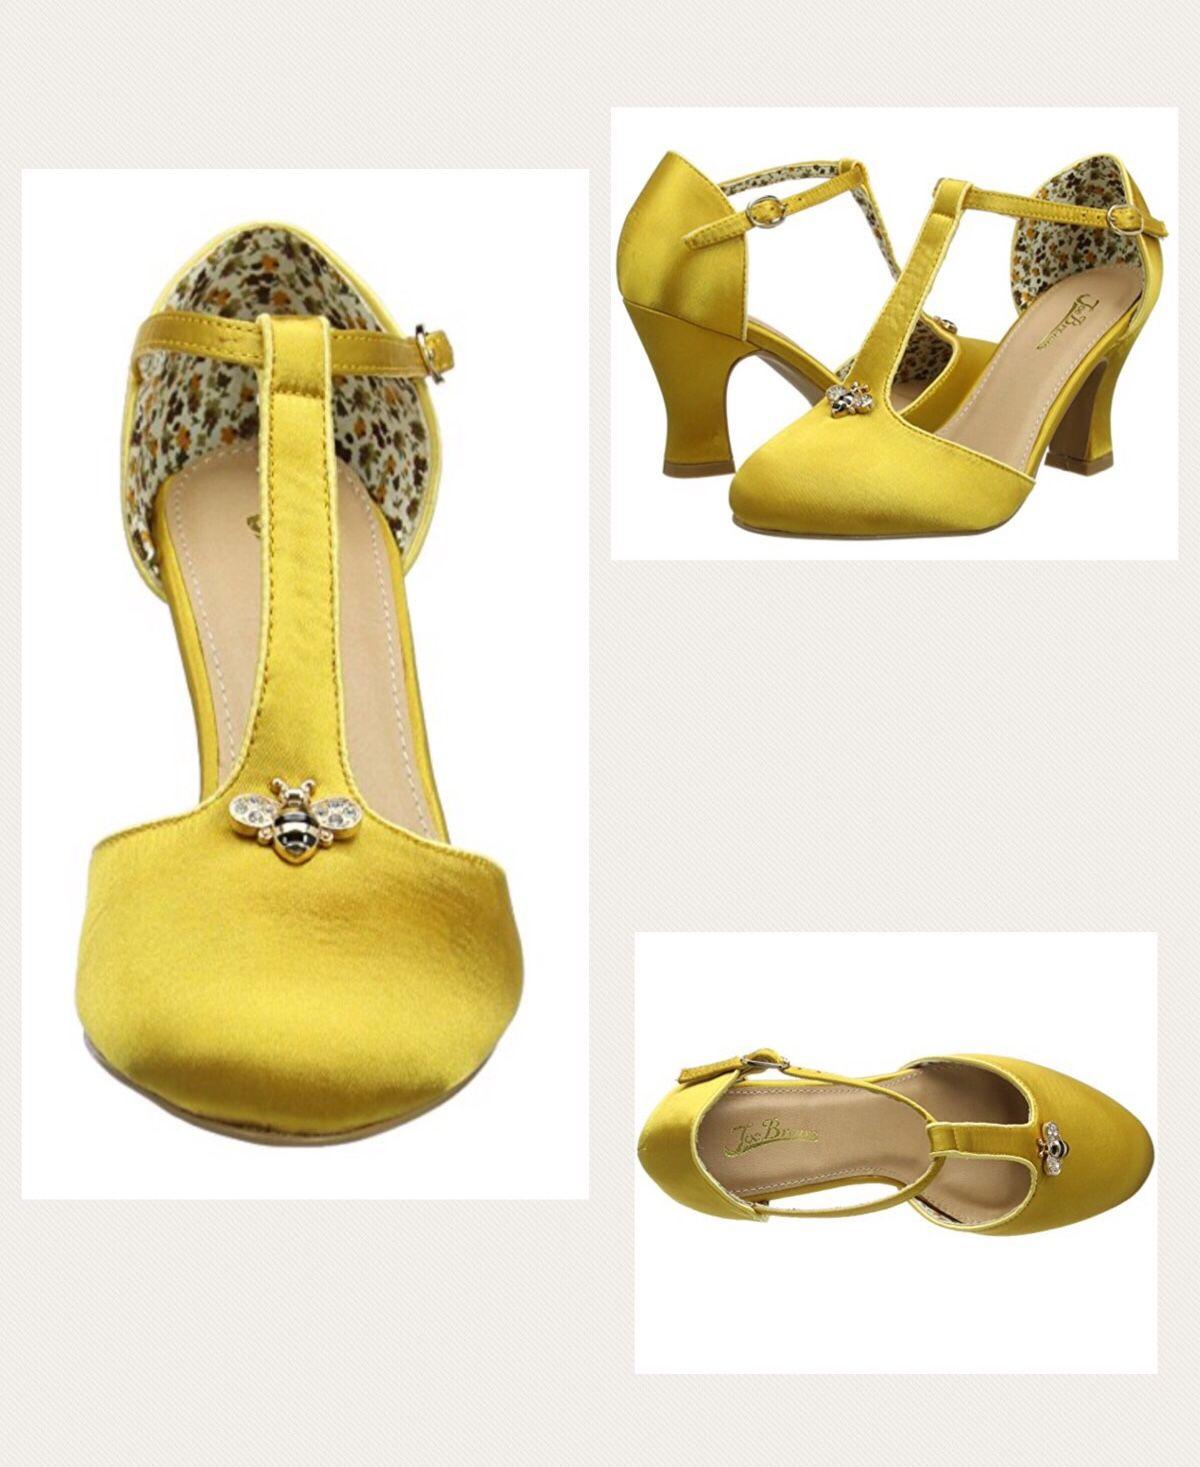 Joe Browns Women S Sweet As Honey Vintage Shoes T Bar Heels Yellow Gold Bumblebee Love Bees Honeybee Bee 1940 Vintage Shoes T Bar Shoes Heart Shoes